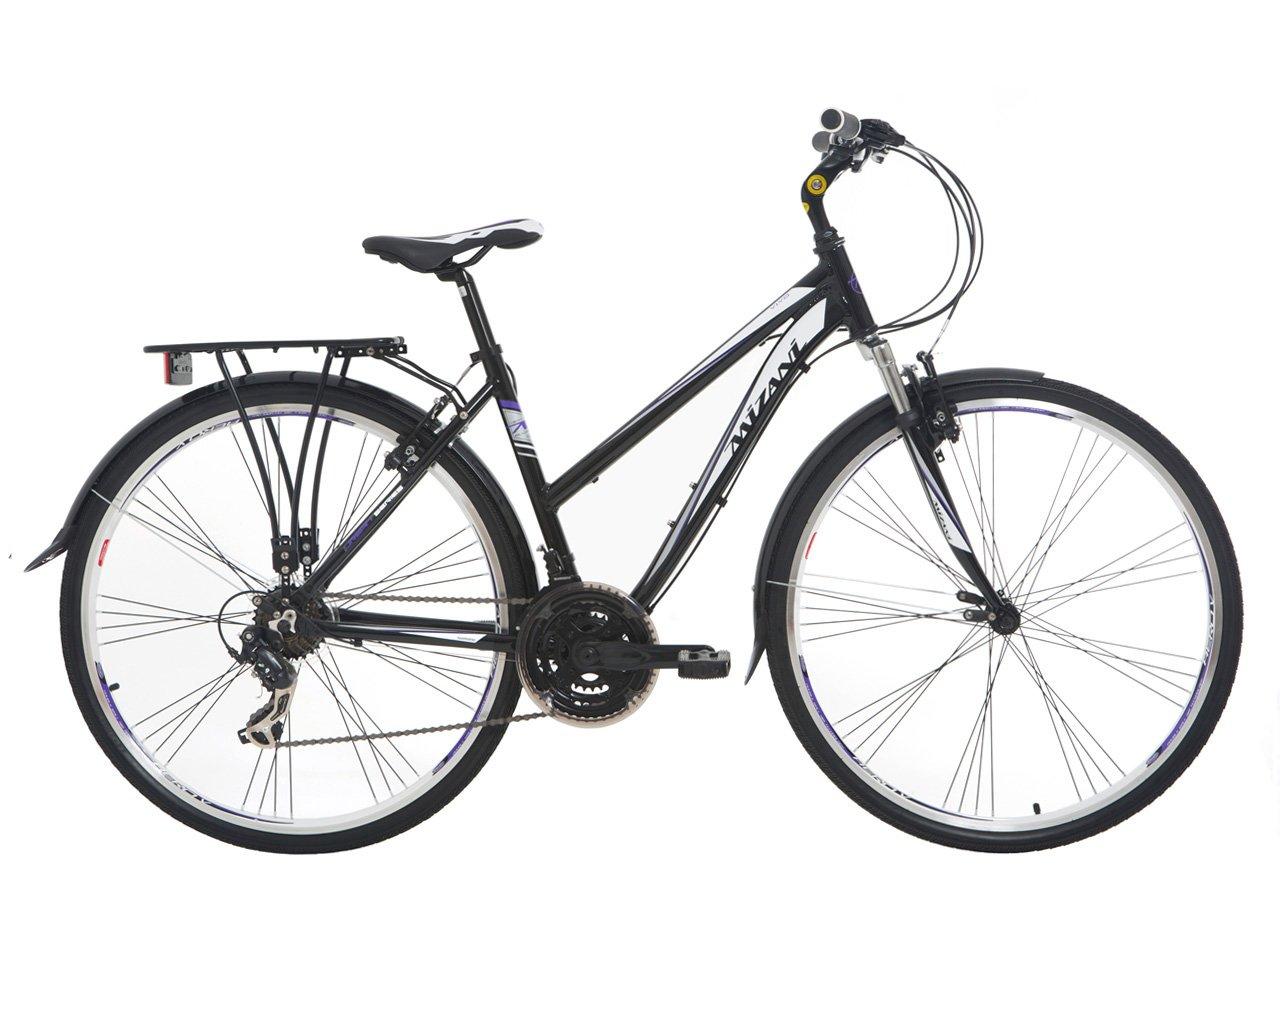 Bicicleta urbana híbrida de 21 velocidades. 15